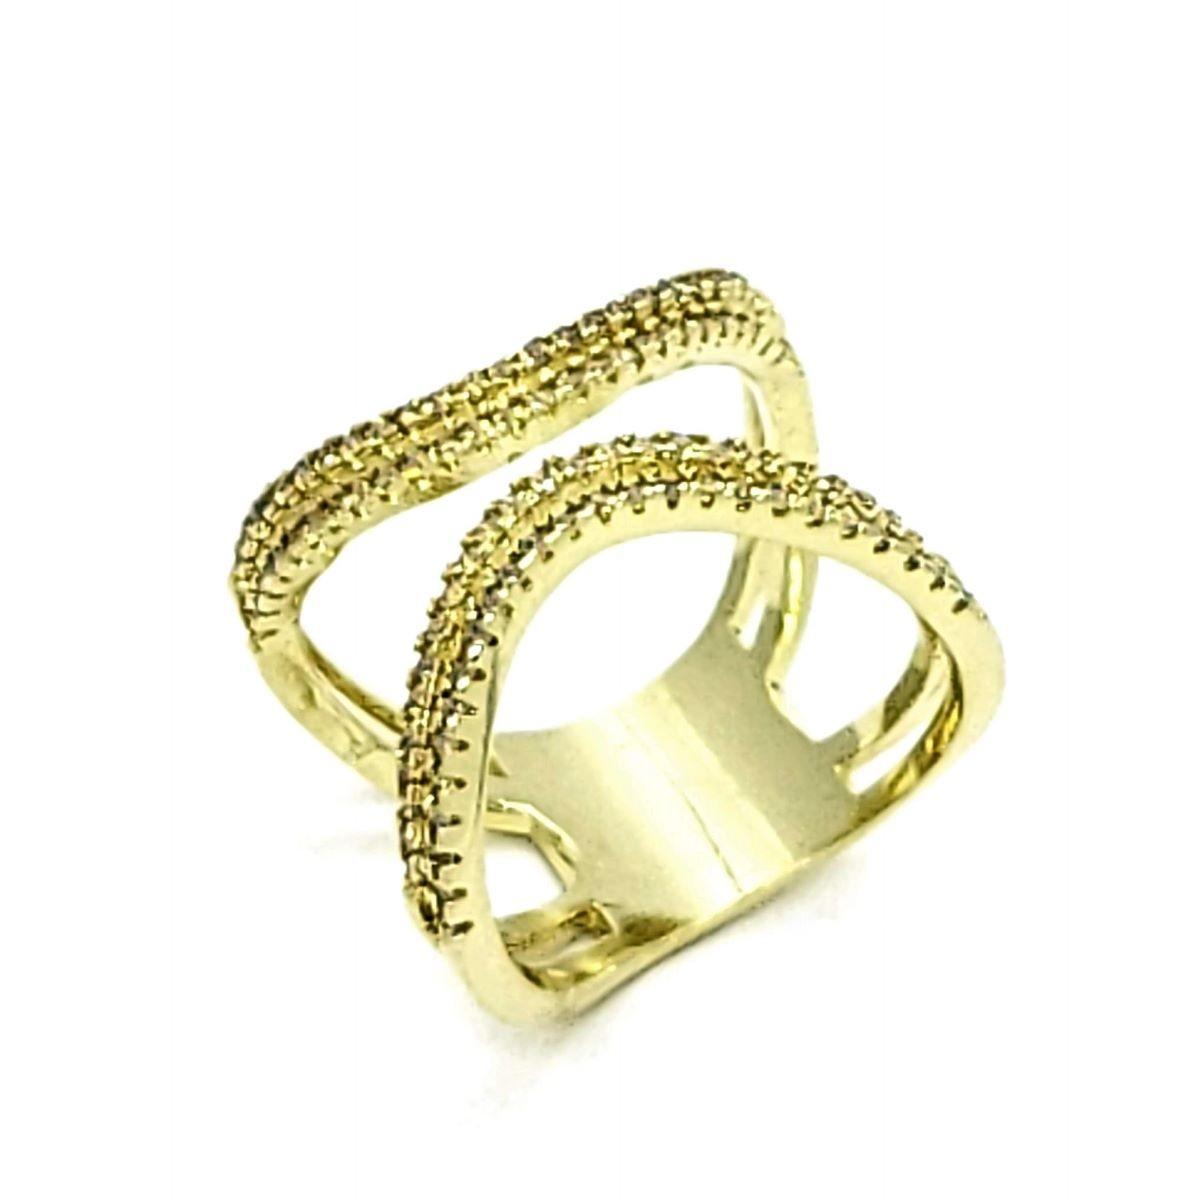 Anel Cravejado De Zirconias Banho De Ouro 18k 4338